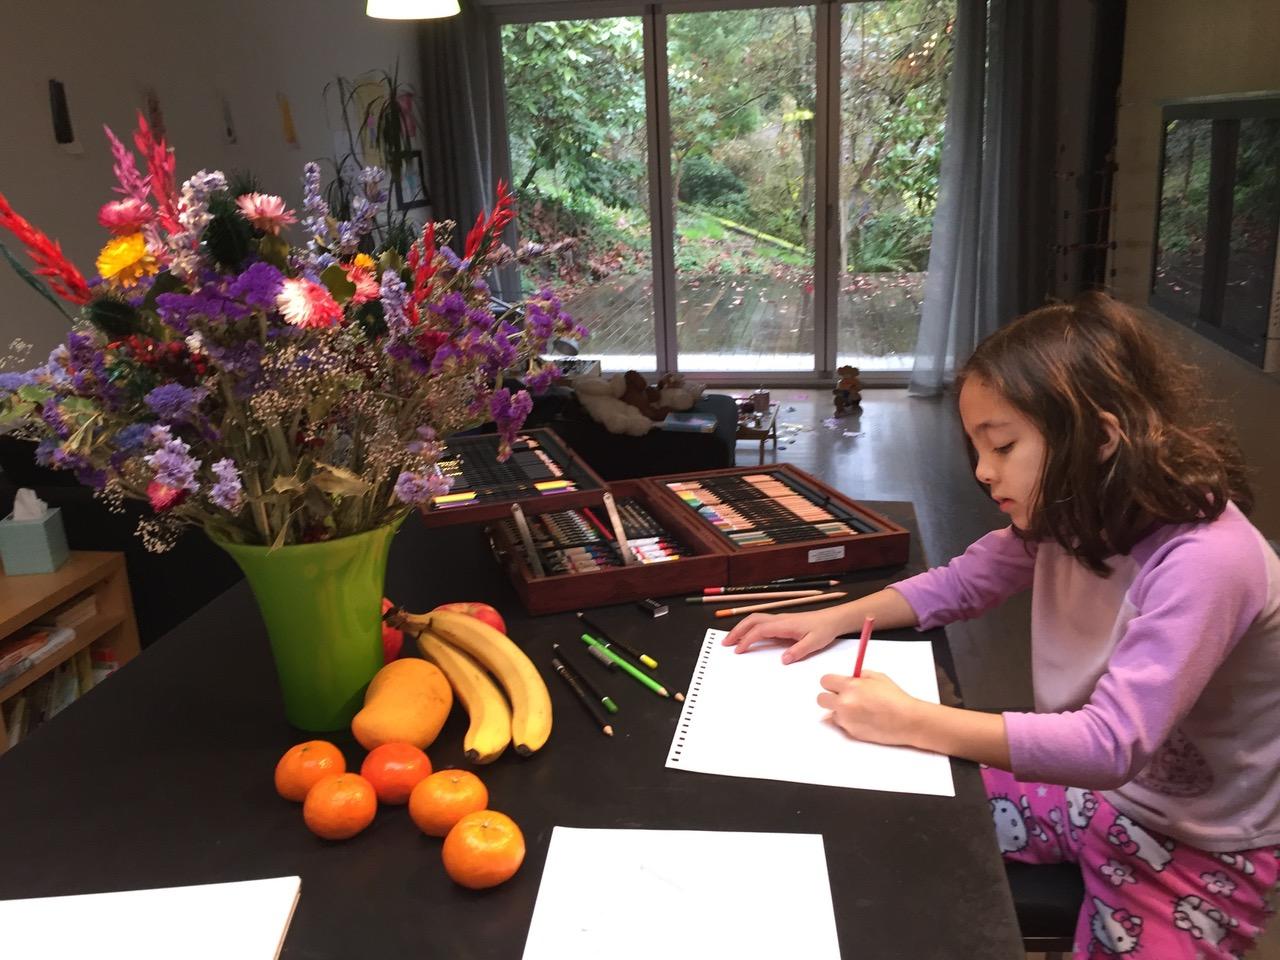 Madeline Alviar, second grader at McGilvra Elementary School, Seattle, Washington creates an art piece to benefit Seattle Children's Hospital